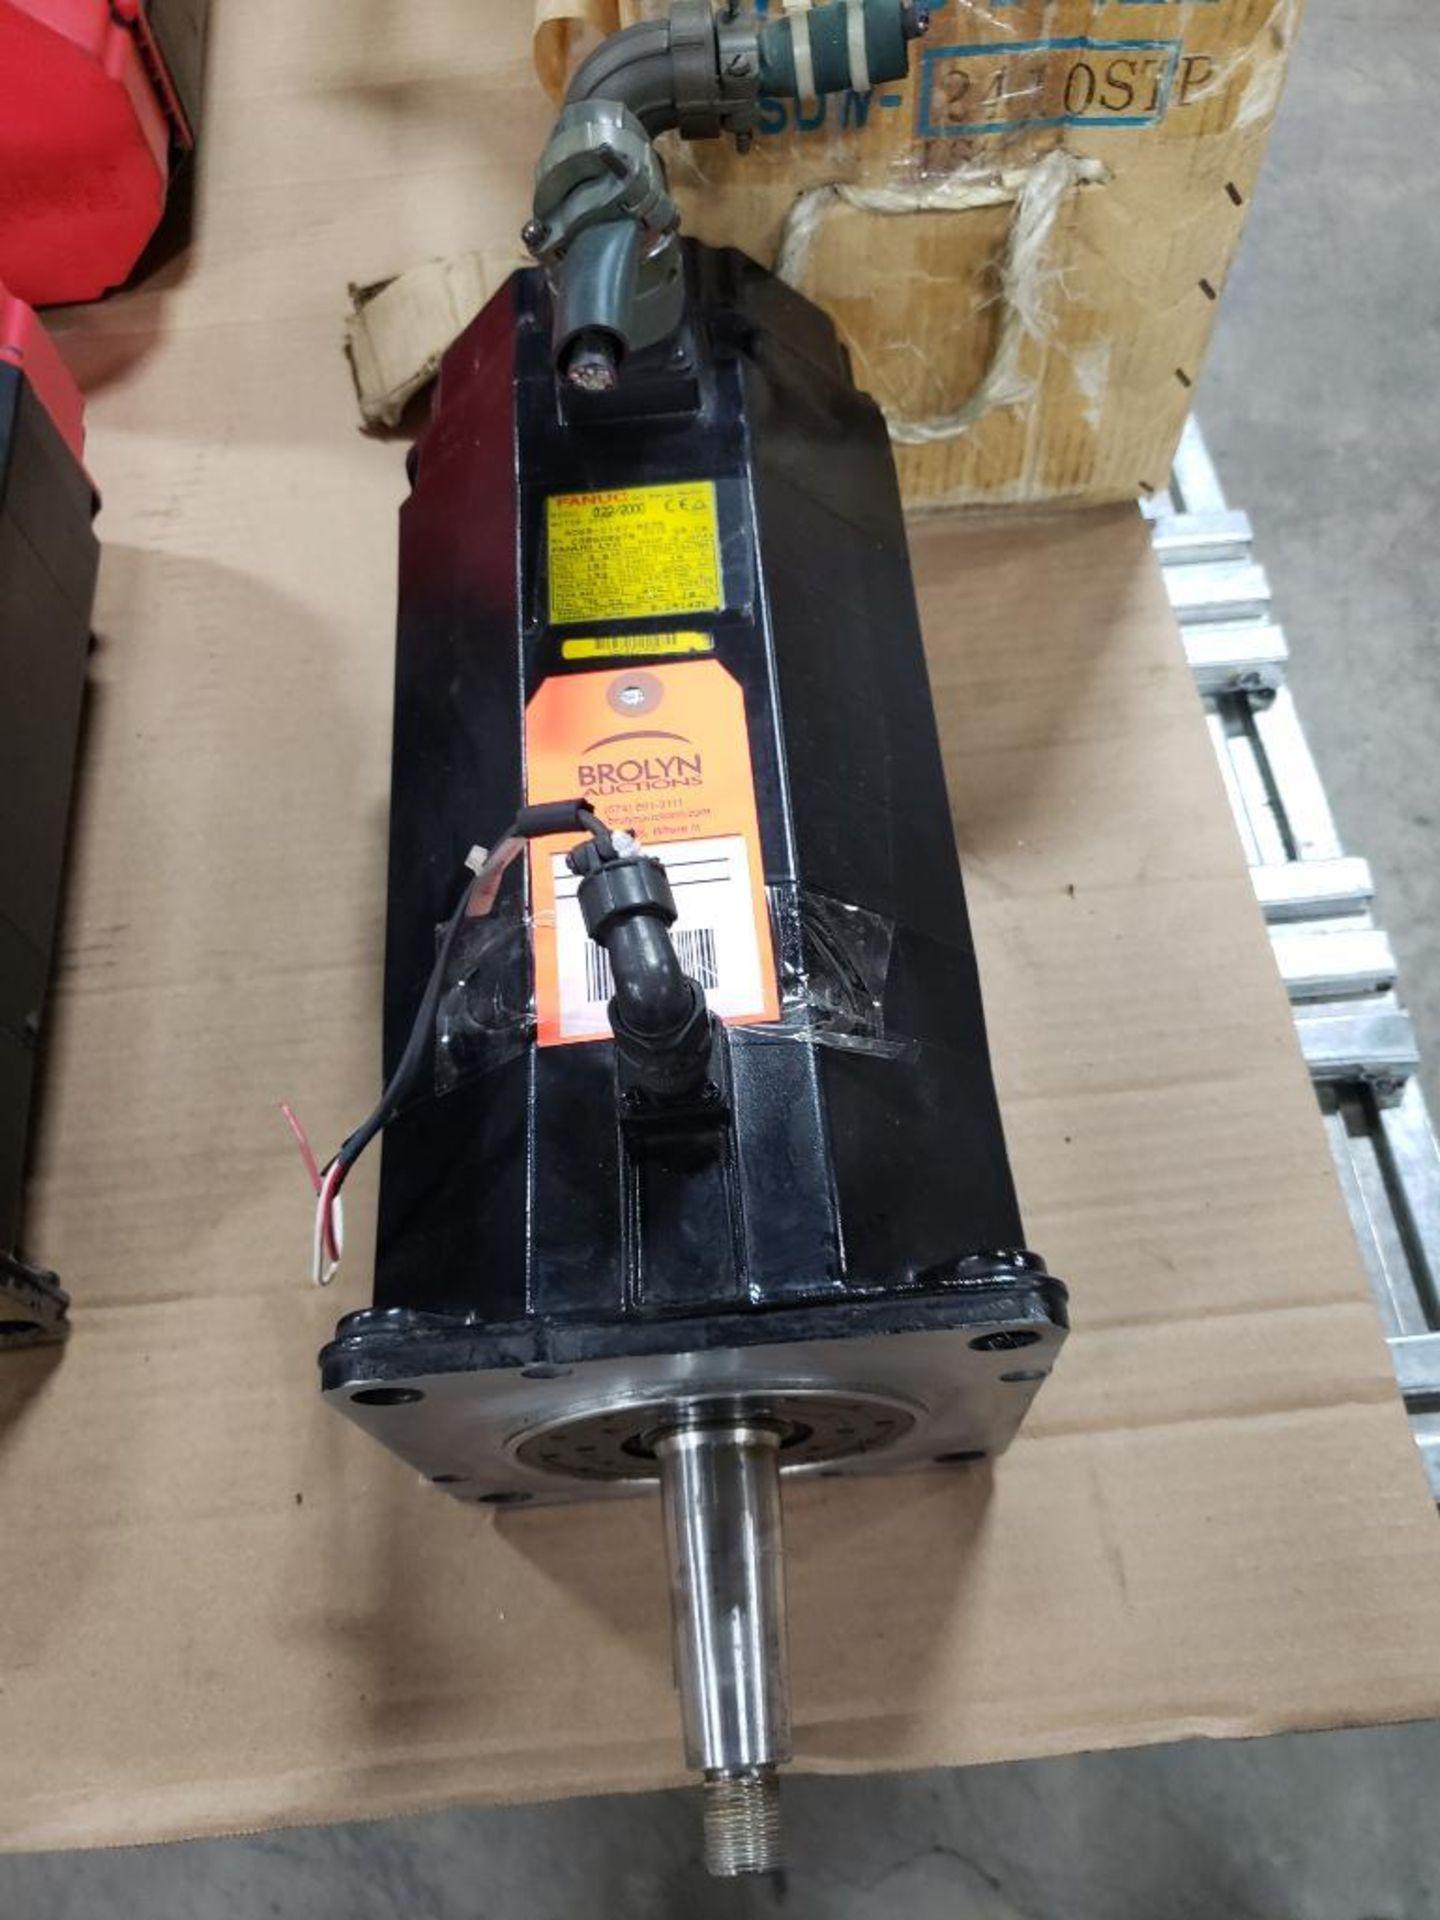 3.8kW GE Fanuc AC Servo Motor A06B-0147-B675. 157V, 2000RPM, 3PH.